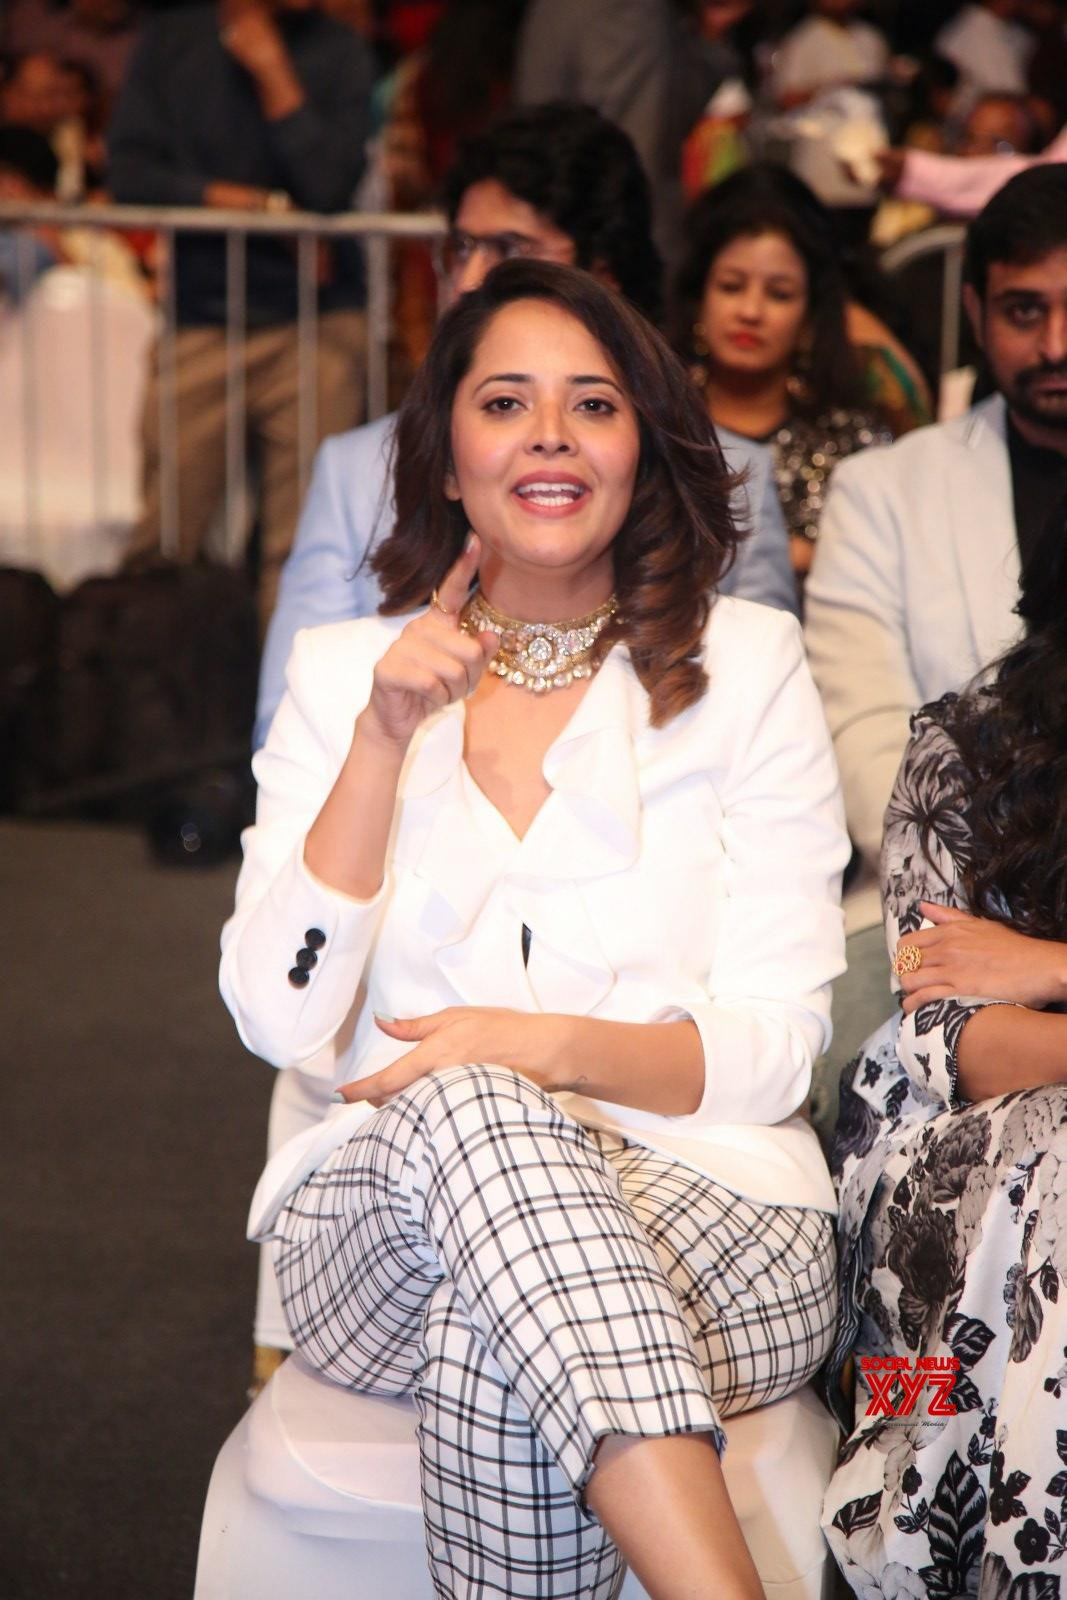 Actress Anasuya Bharadwaj Stills From SIIMA Awards 2019 Red Carpet